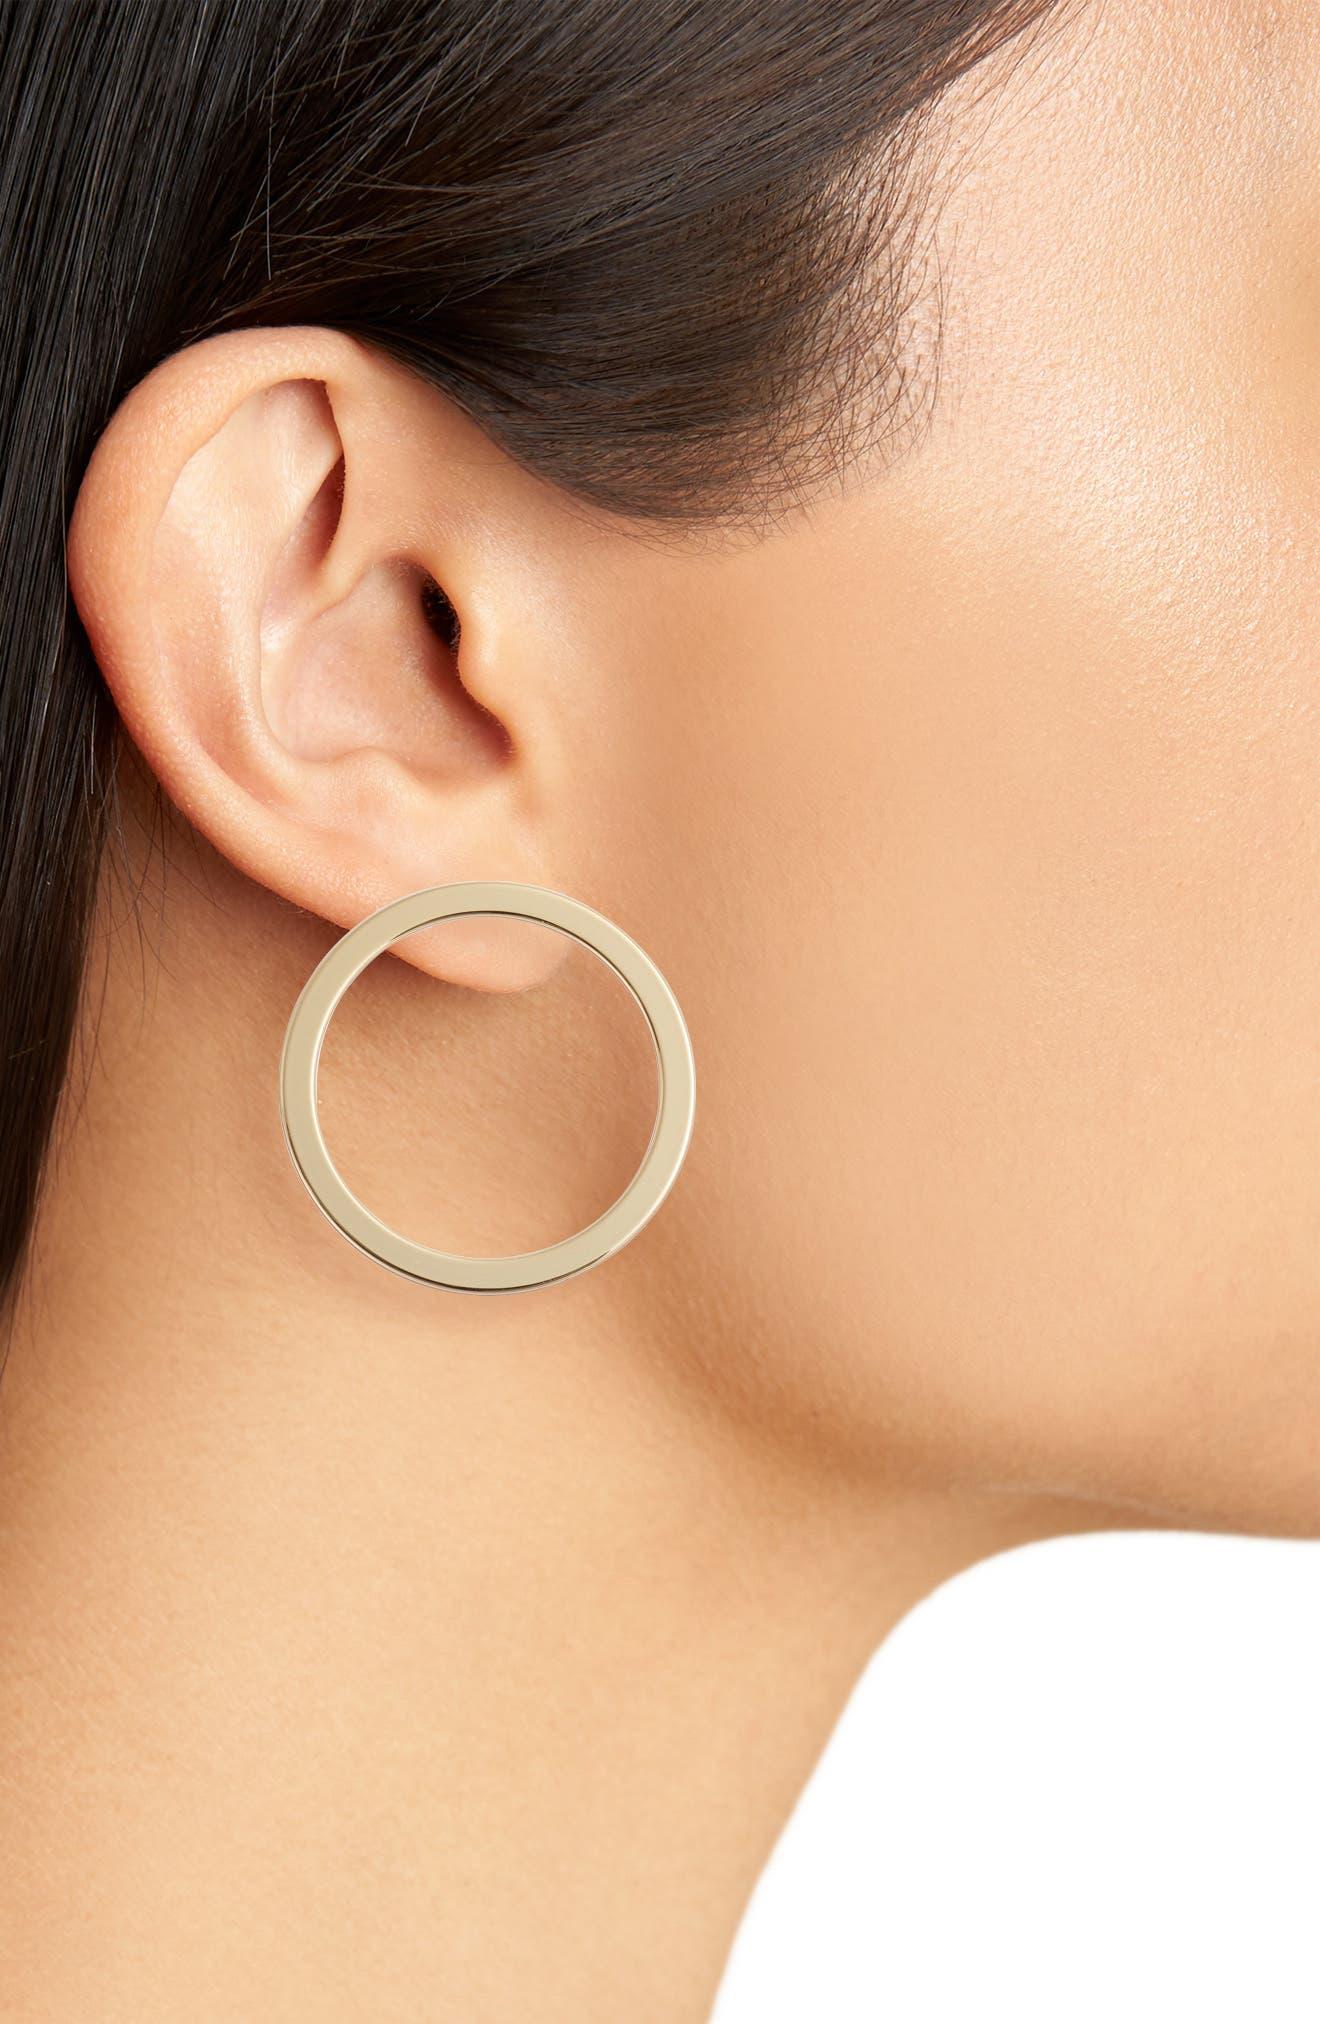 Separate Ways Earrings,                             Alternate thumbnail 2, color,                             GOLD